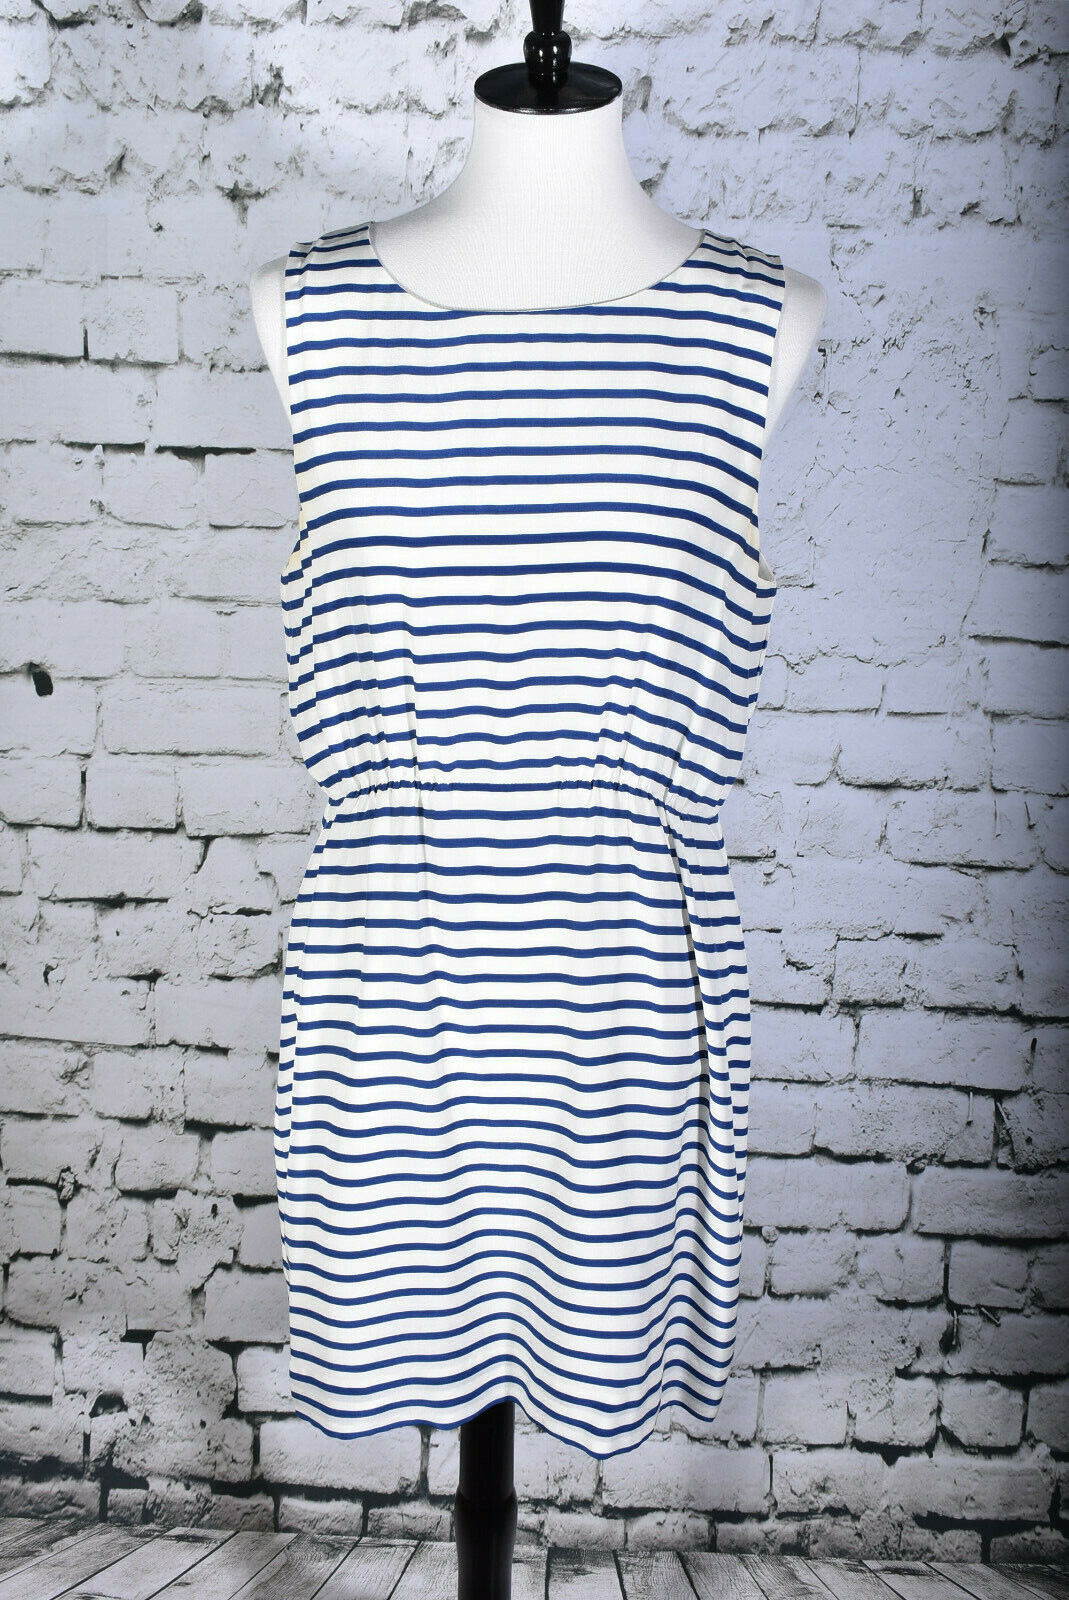 J CREW Größe 12 100% Silk Blau Weiß Striped Dress Knee Length Sleeveless Blouson